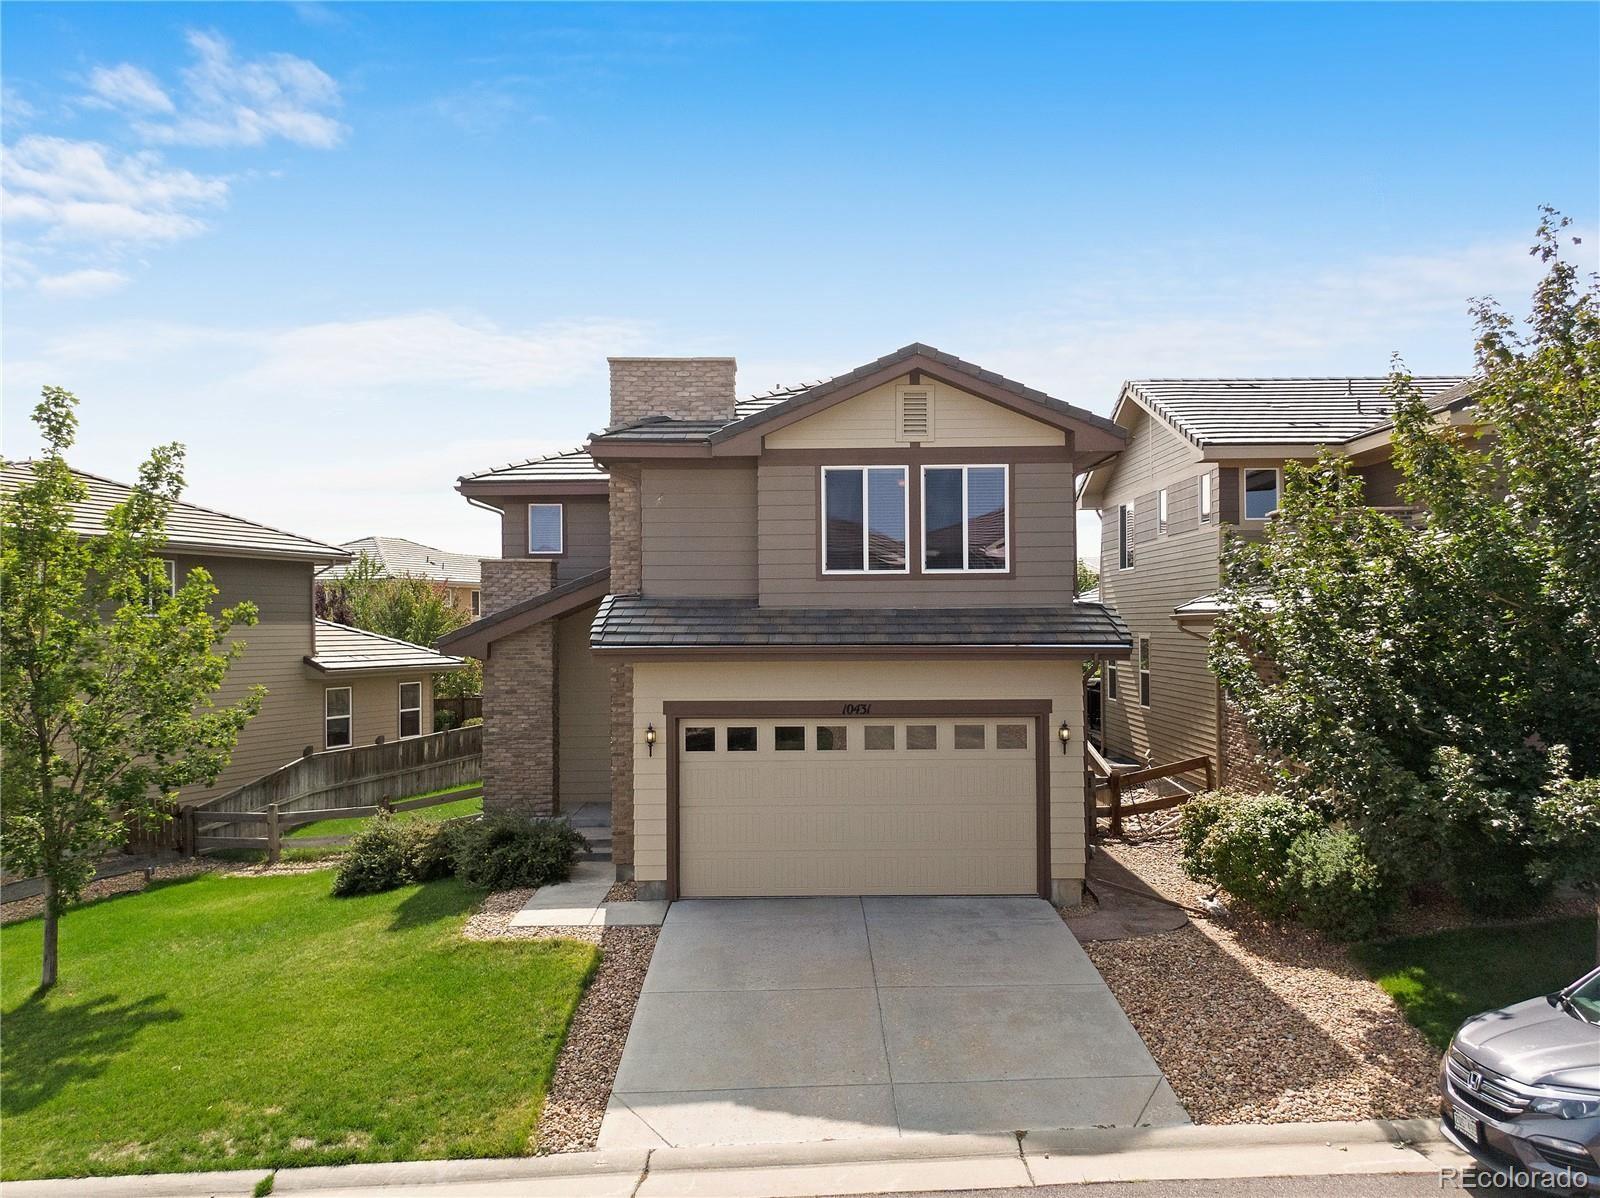 10431 Rutledge Street, Parker, CO 80134 - MLS#: 4574975